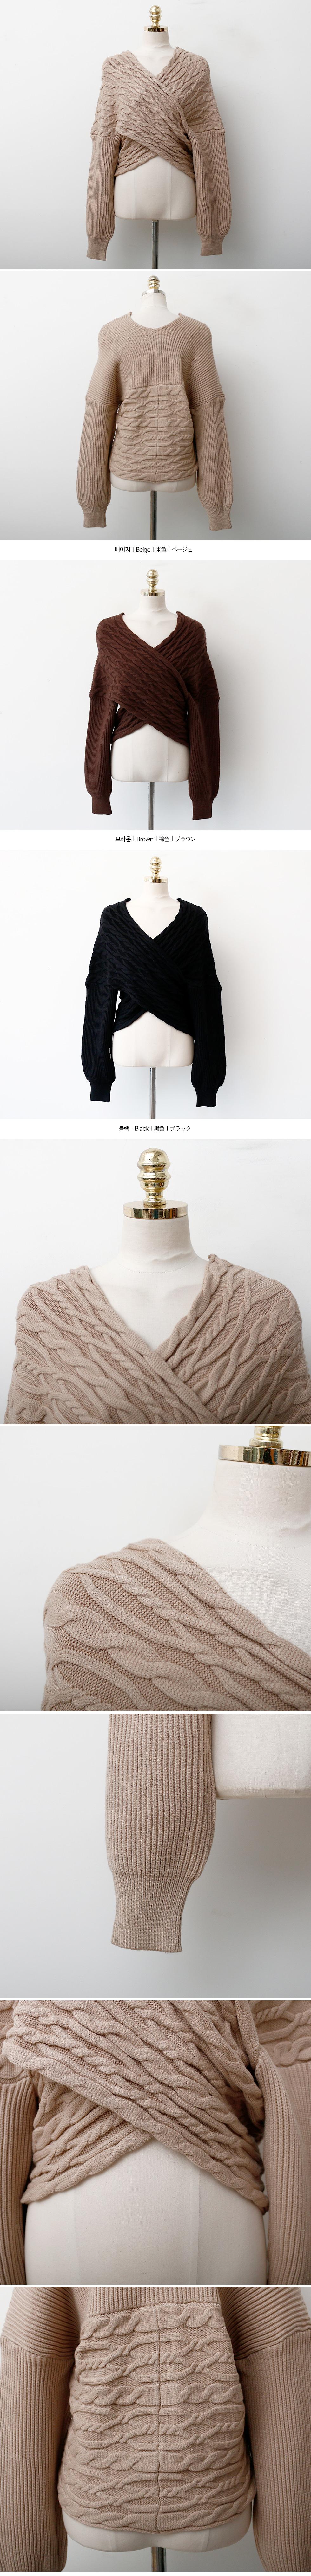 Yeori Exhaust Wrap Knit